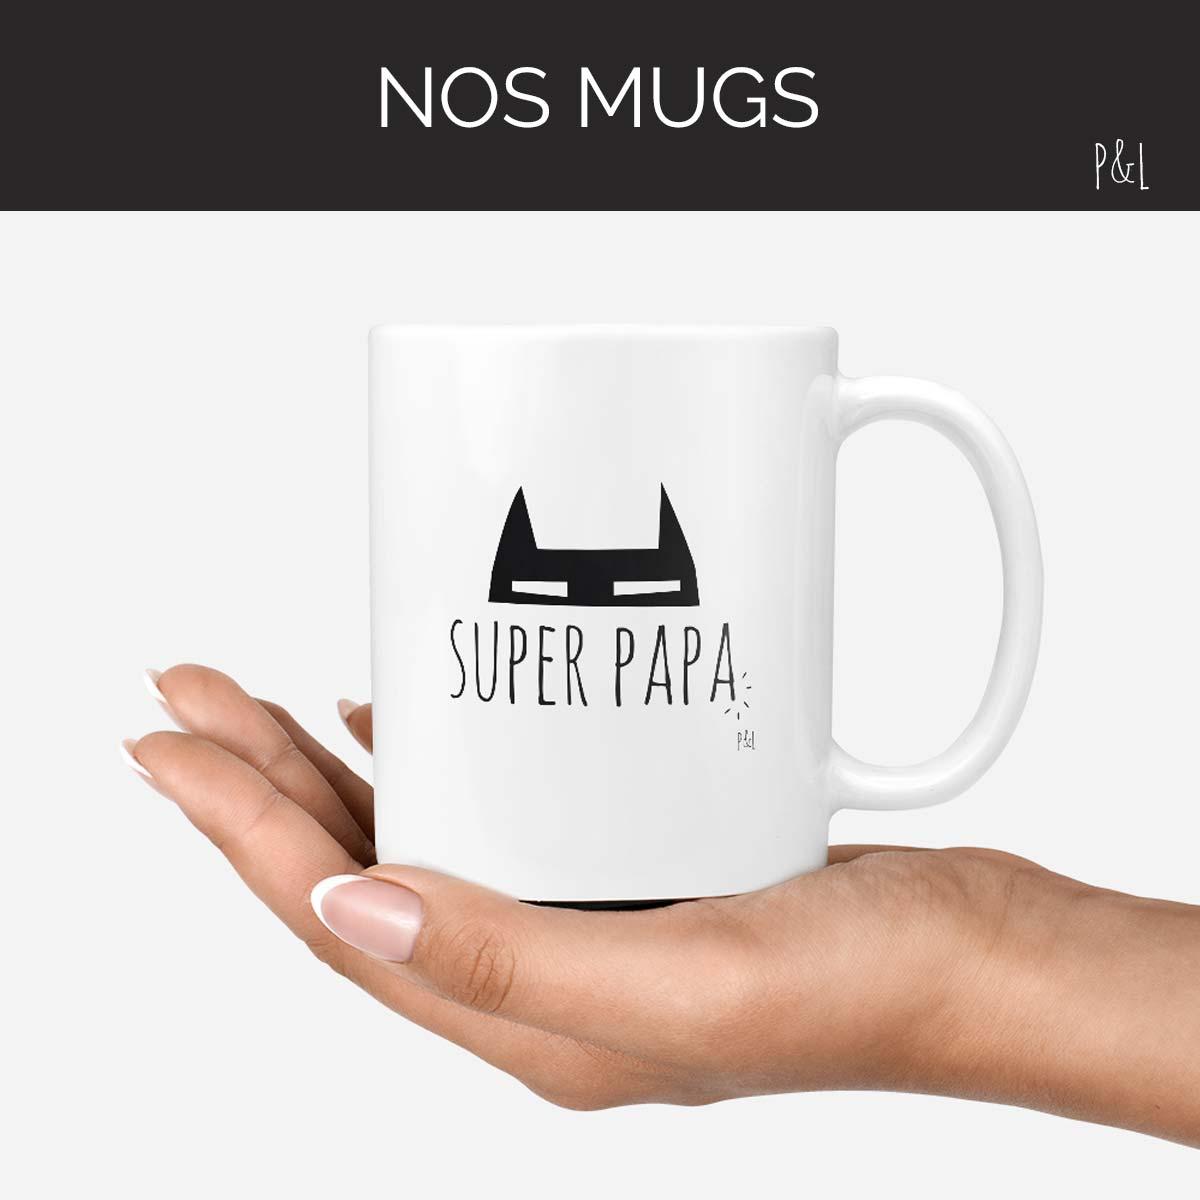 Mug by Pilou et Lilou